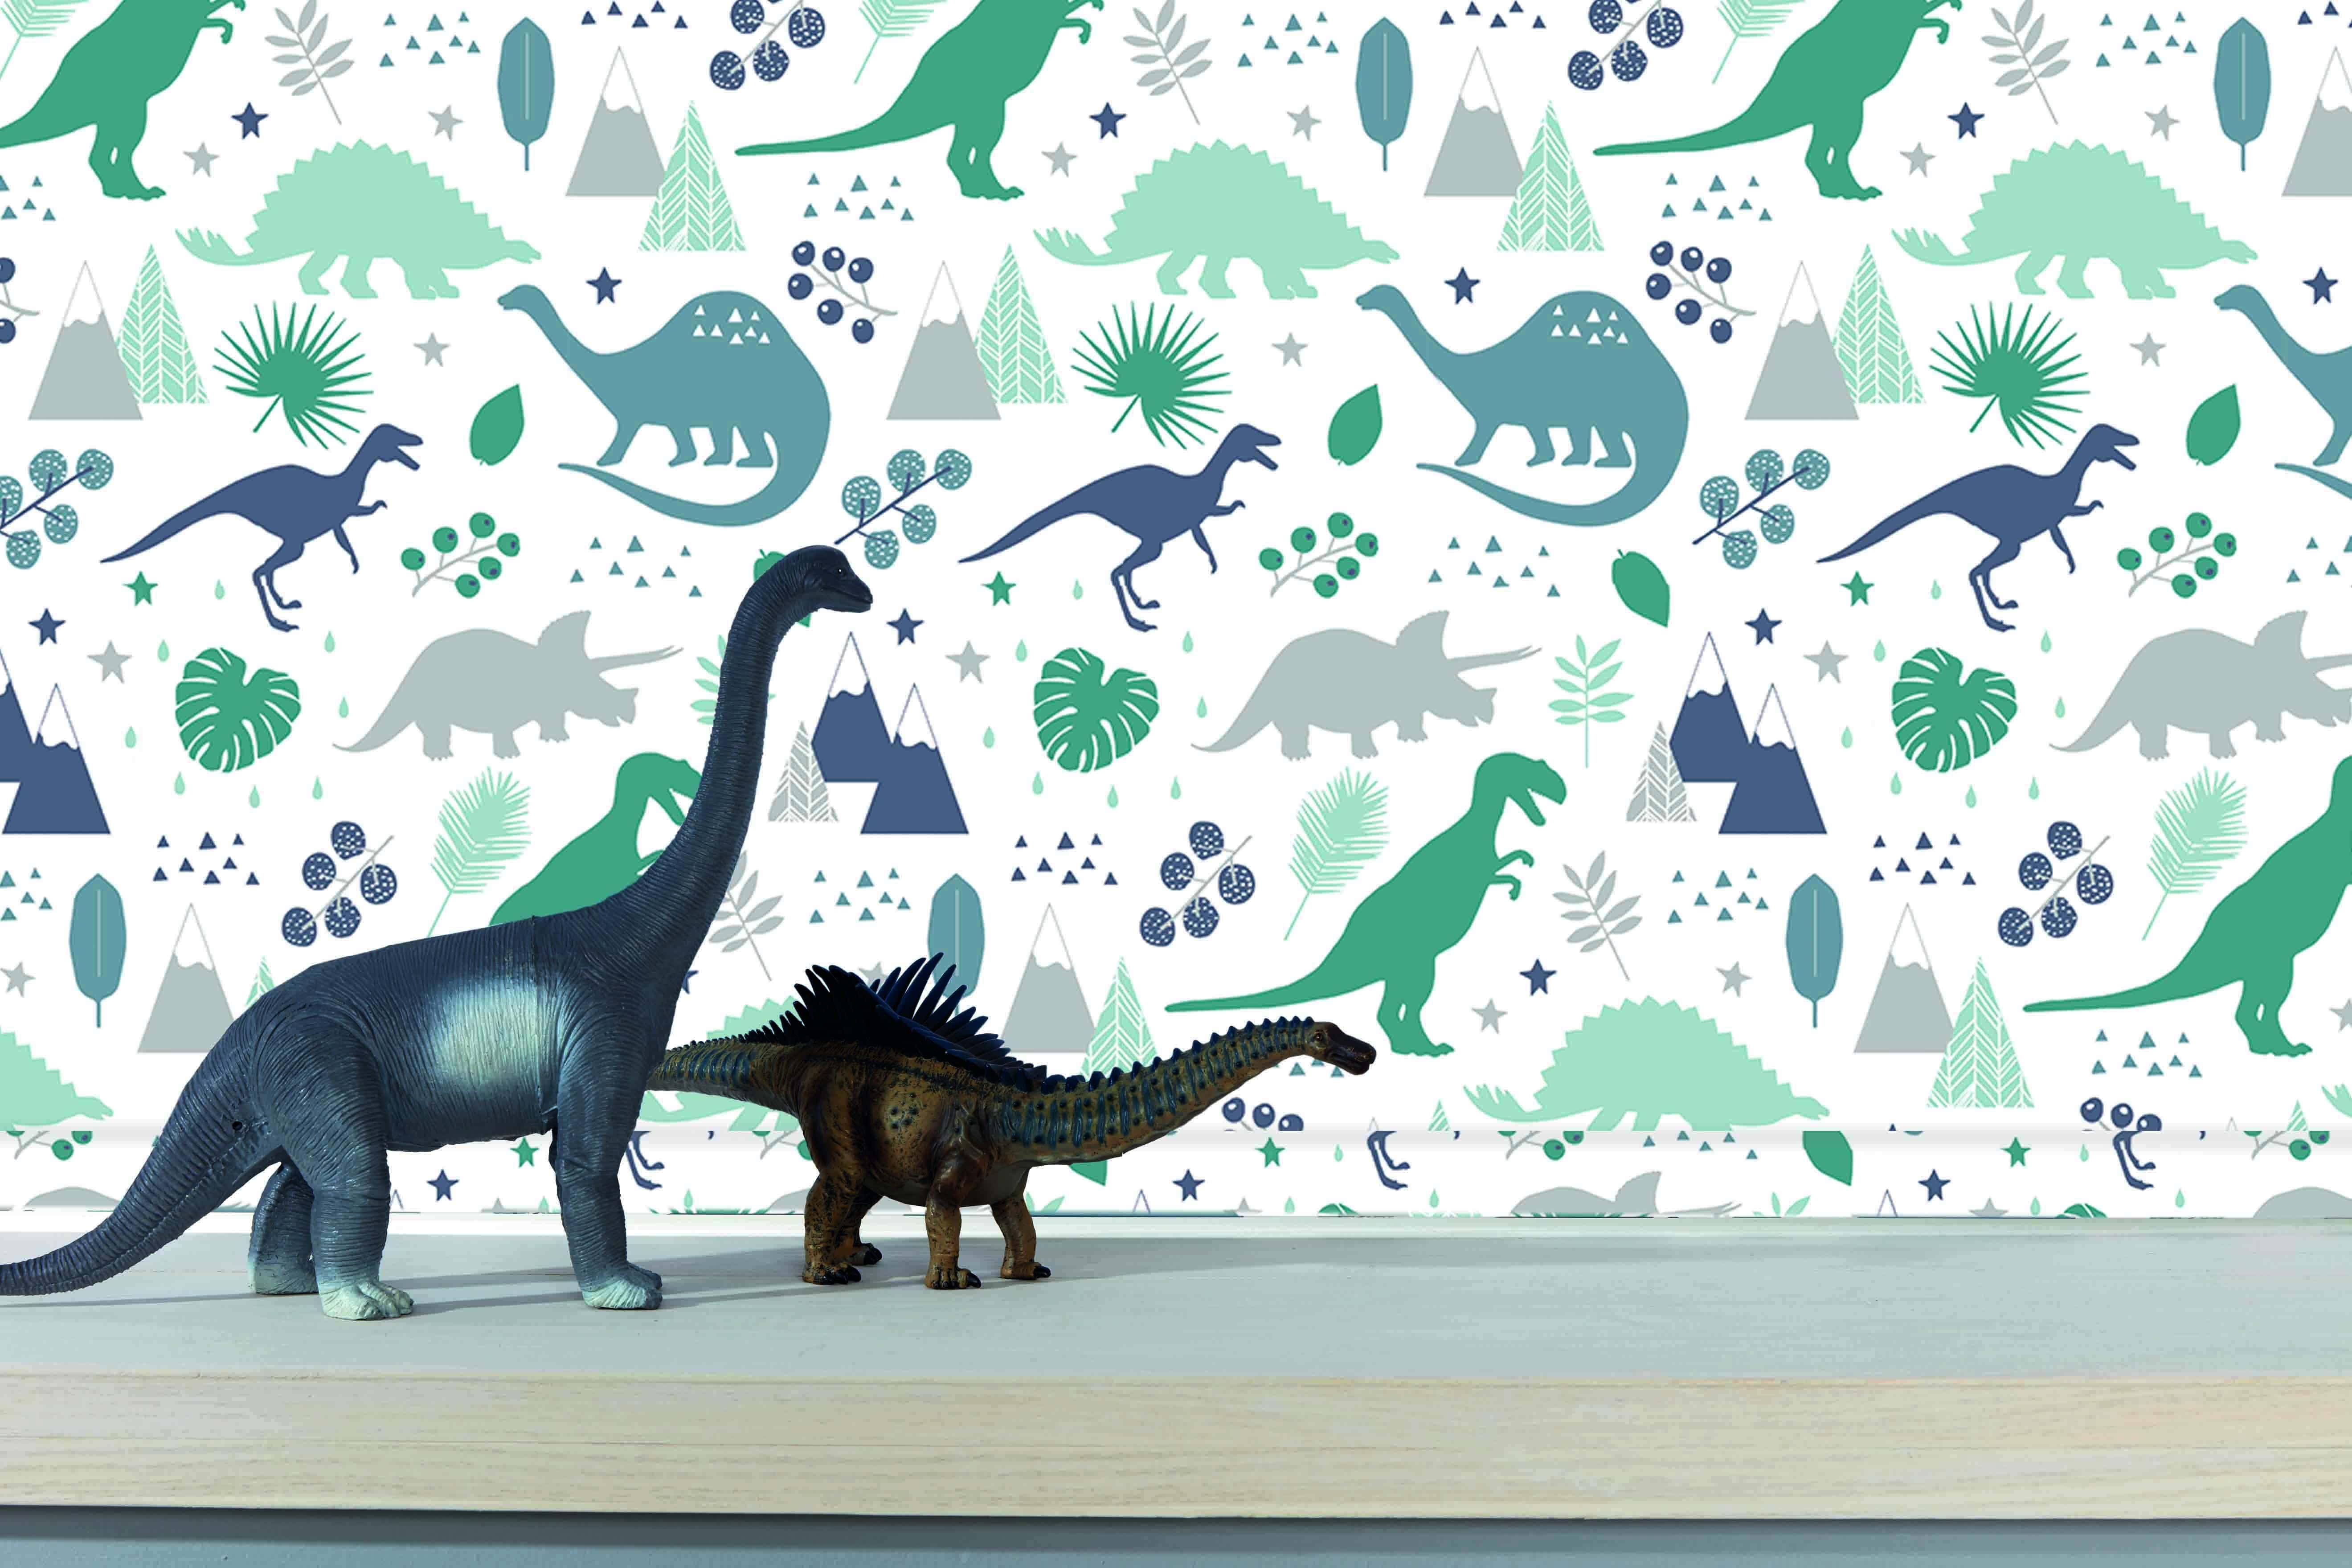 Jurassic roller blind design. Dinosaurs in shades of green on cream background